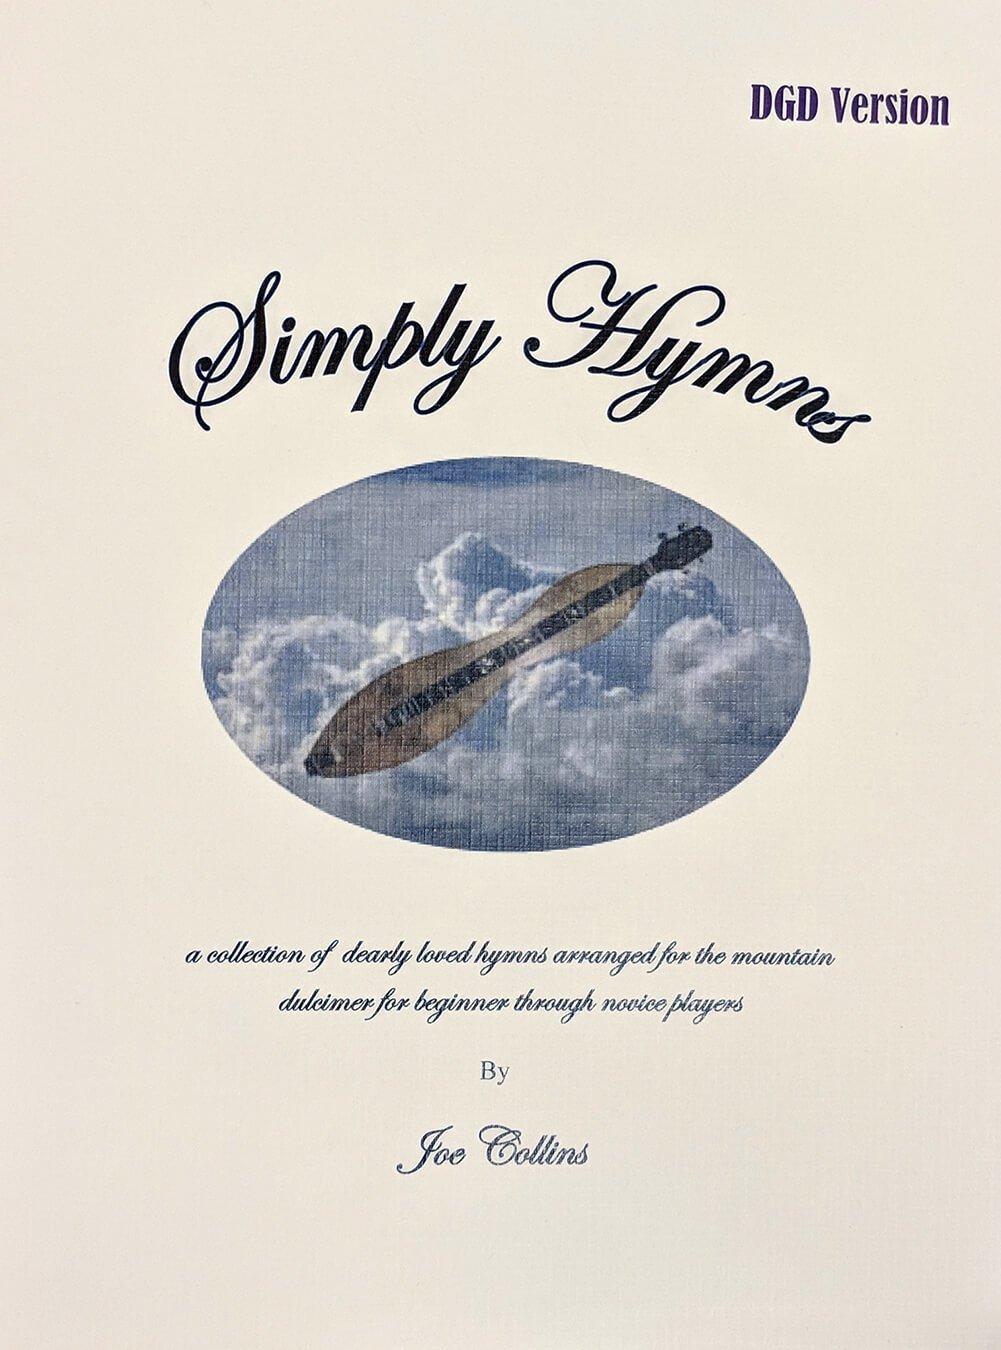 Joe Collins - Simply Hymns, DGD Version